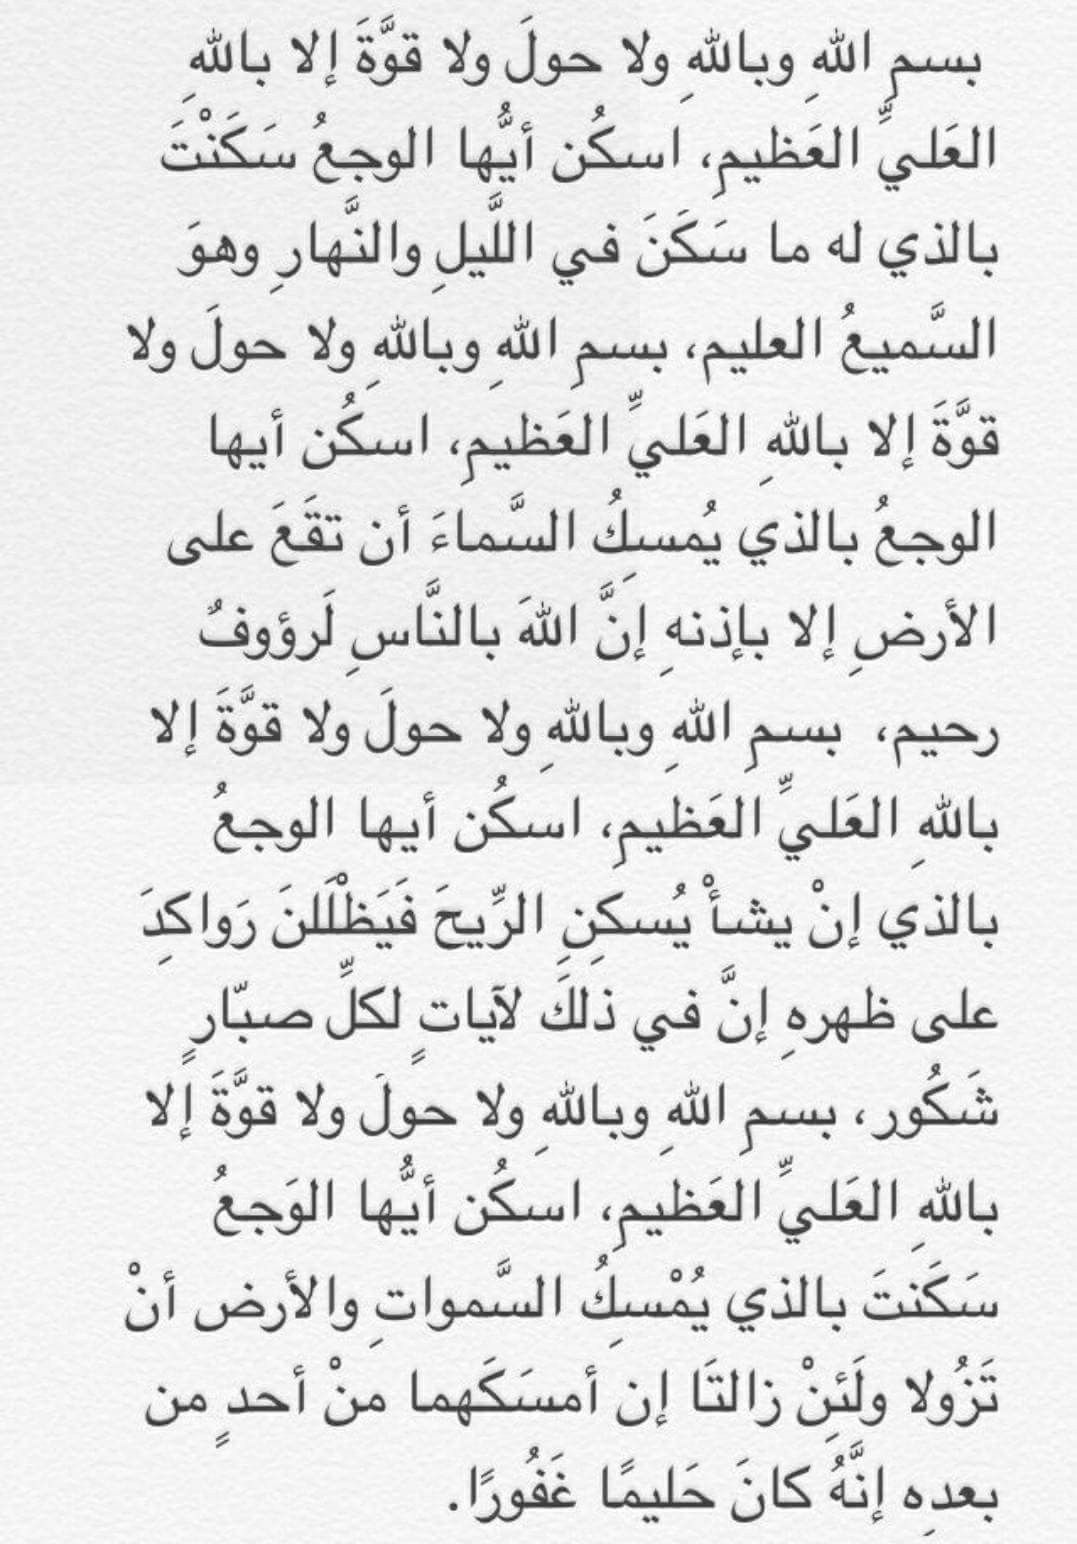 دعاء للمريض Islamic Phrases Islamic Quotes Quran Quotes